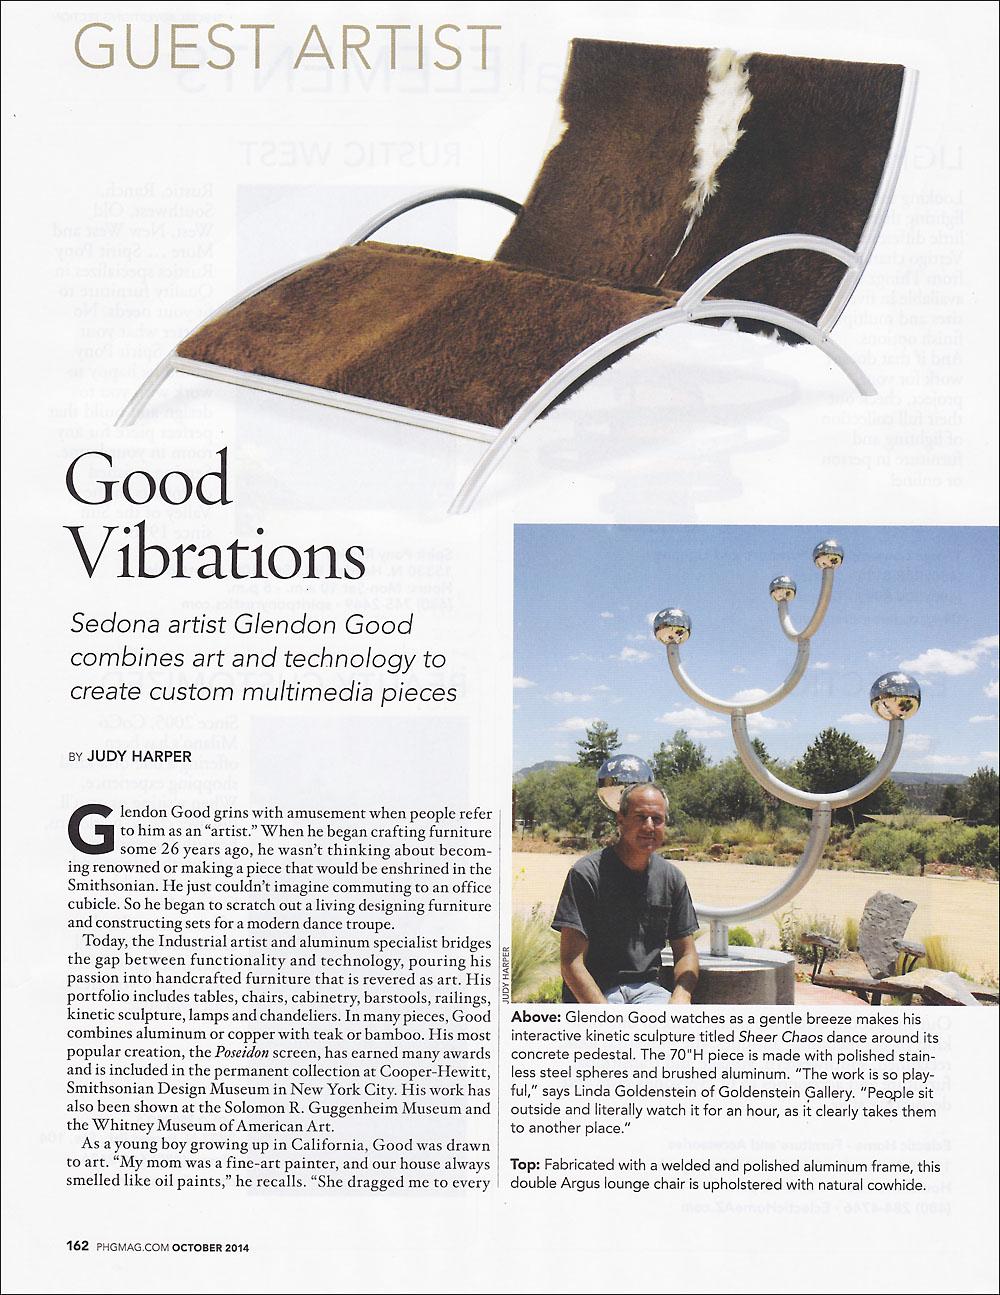 Glendon Good Sedona